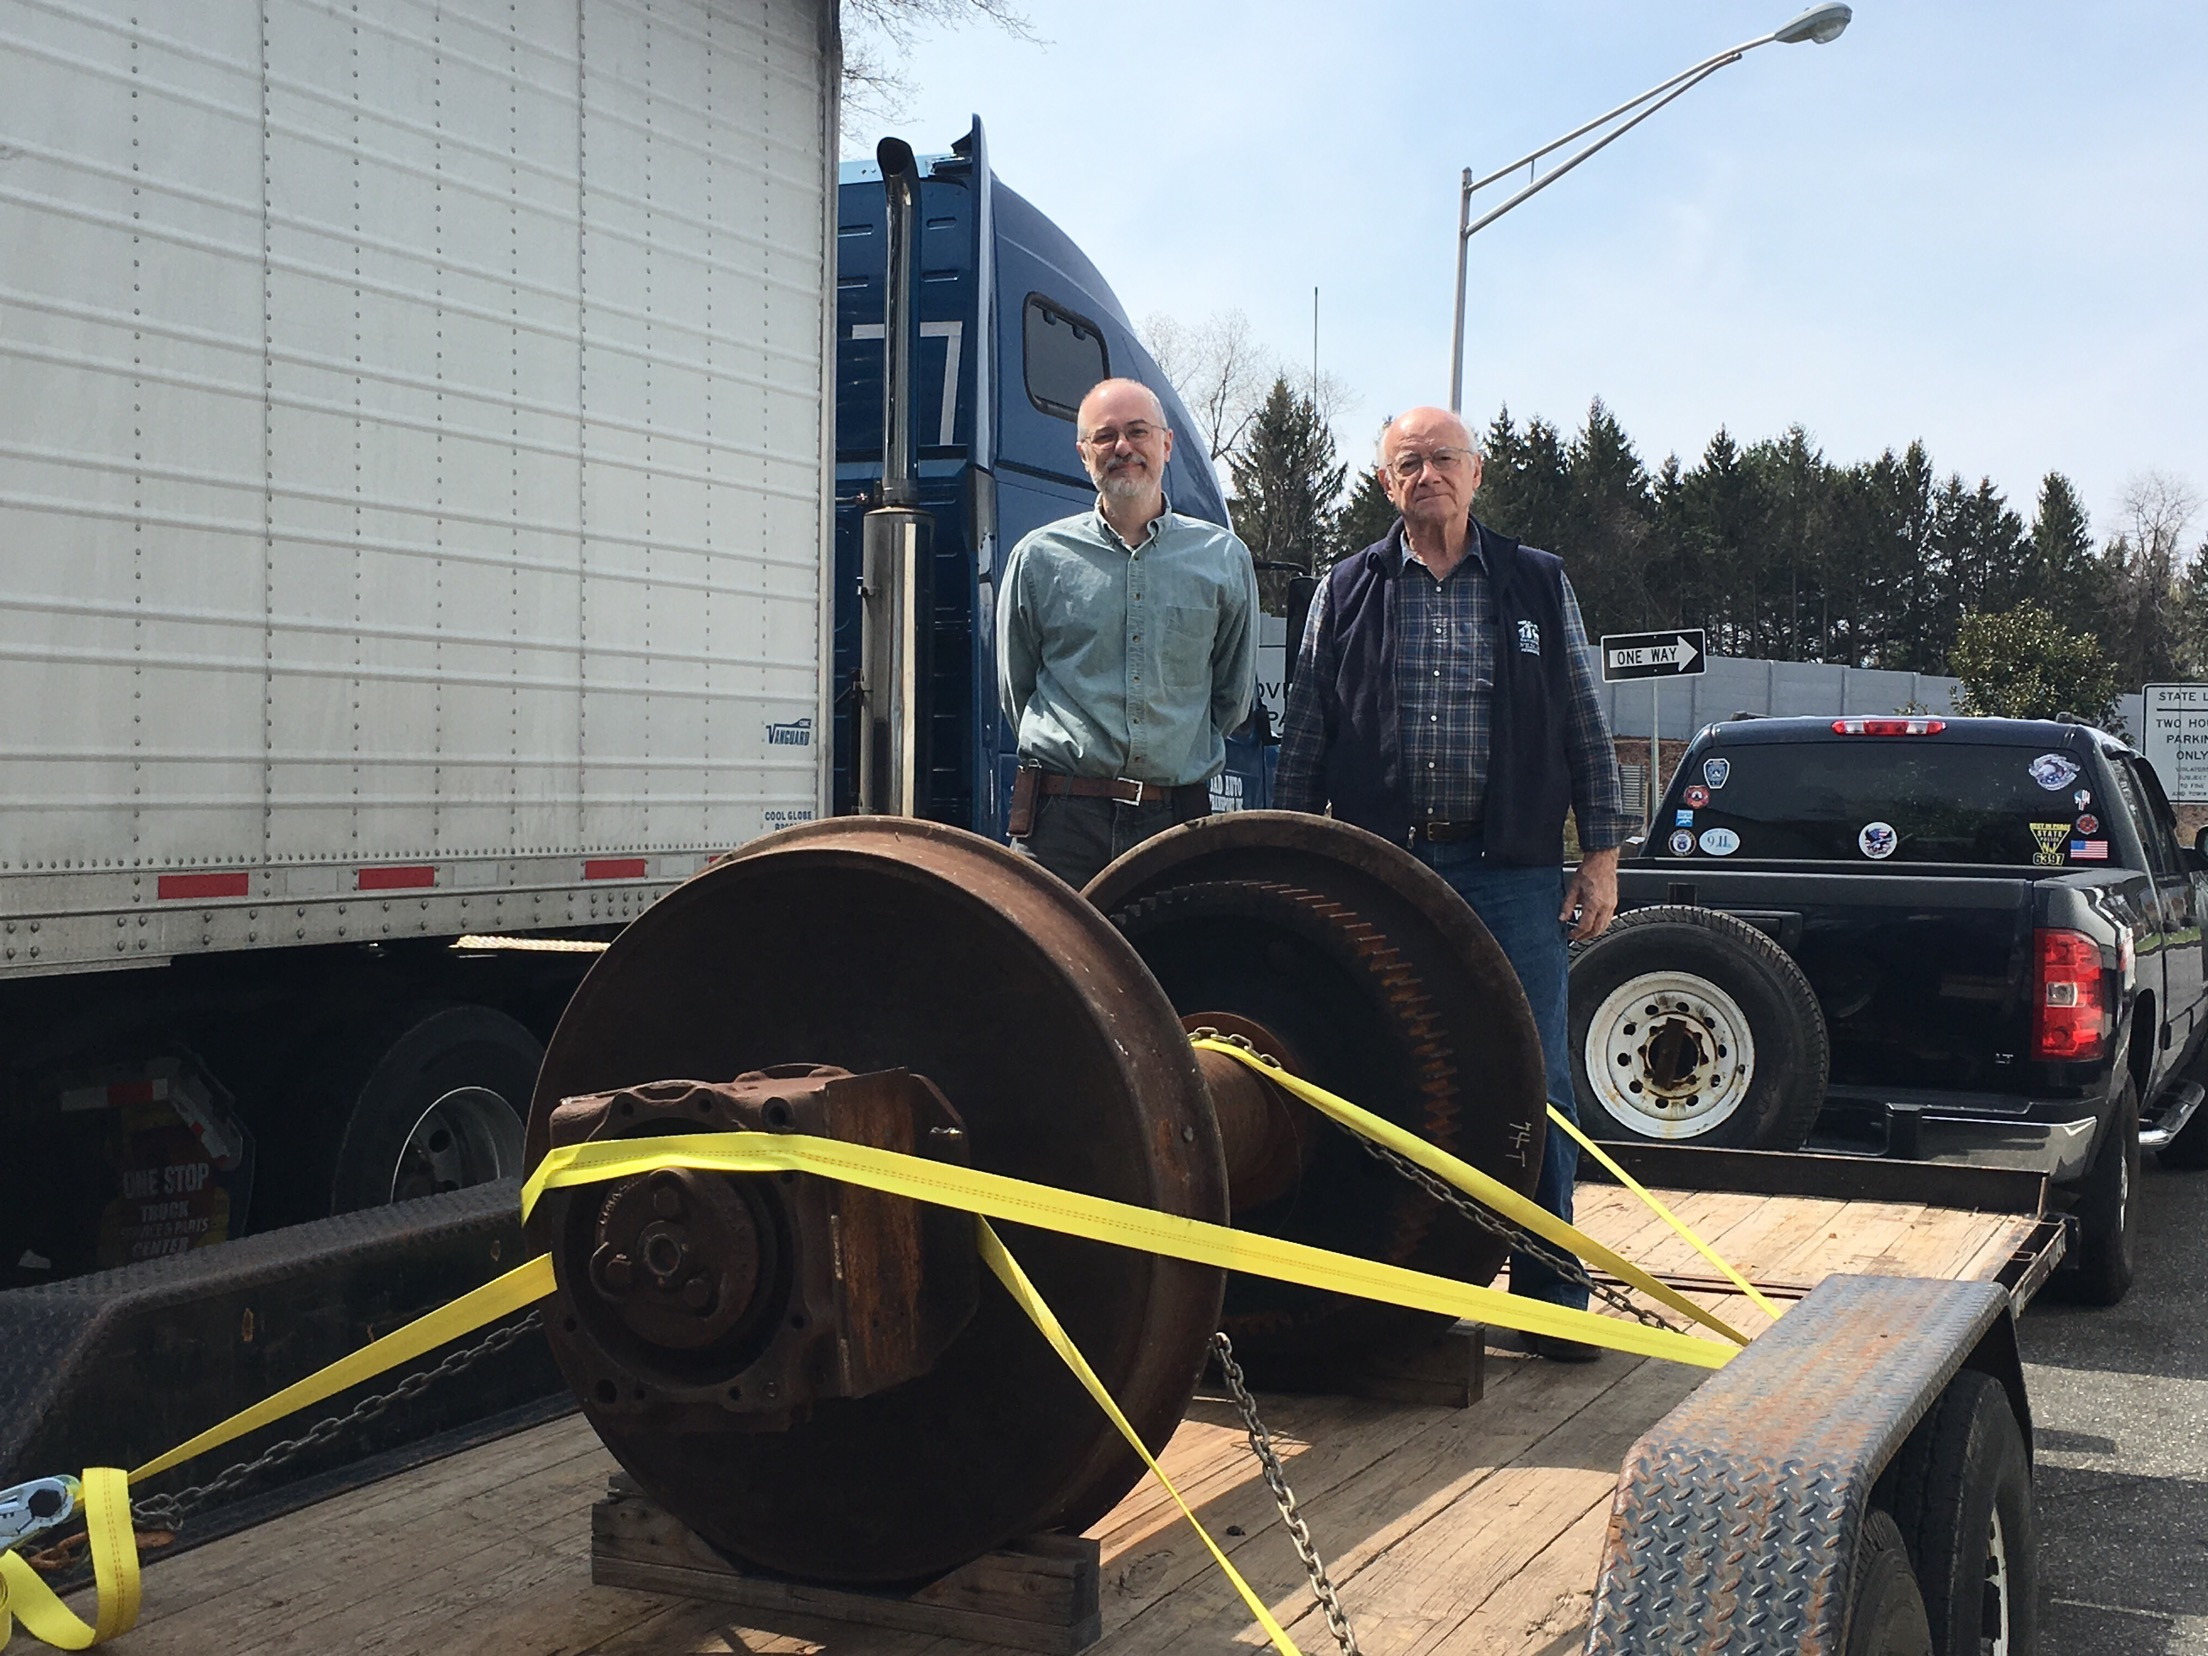 Steve Falco and Bob Bodenstein on the road headed to UTC.